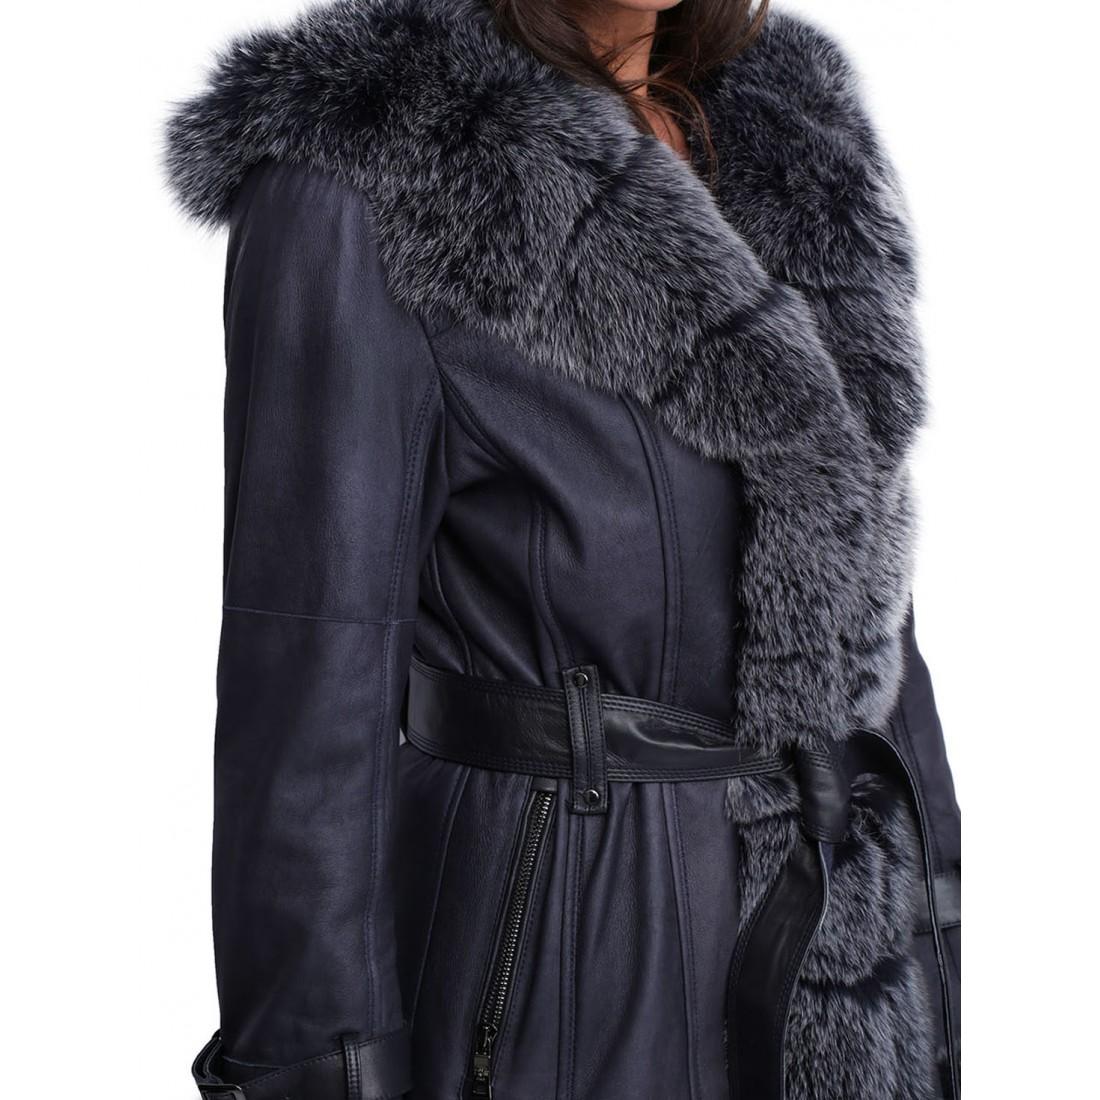 Manteau capuche fourrure femme Giovanni Oty short bleu marine